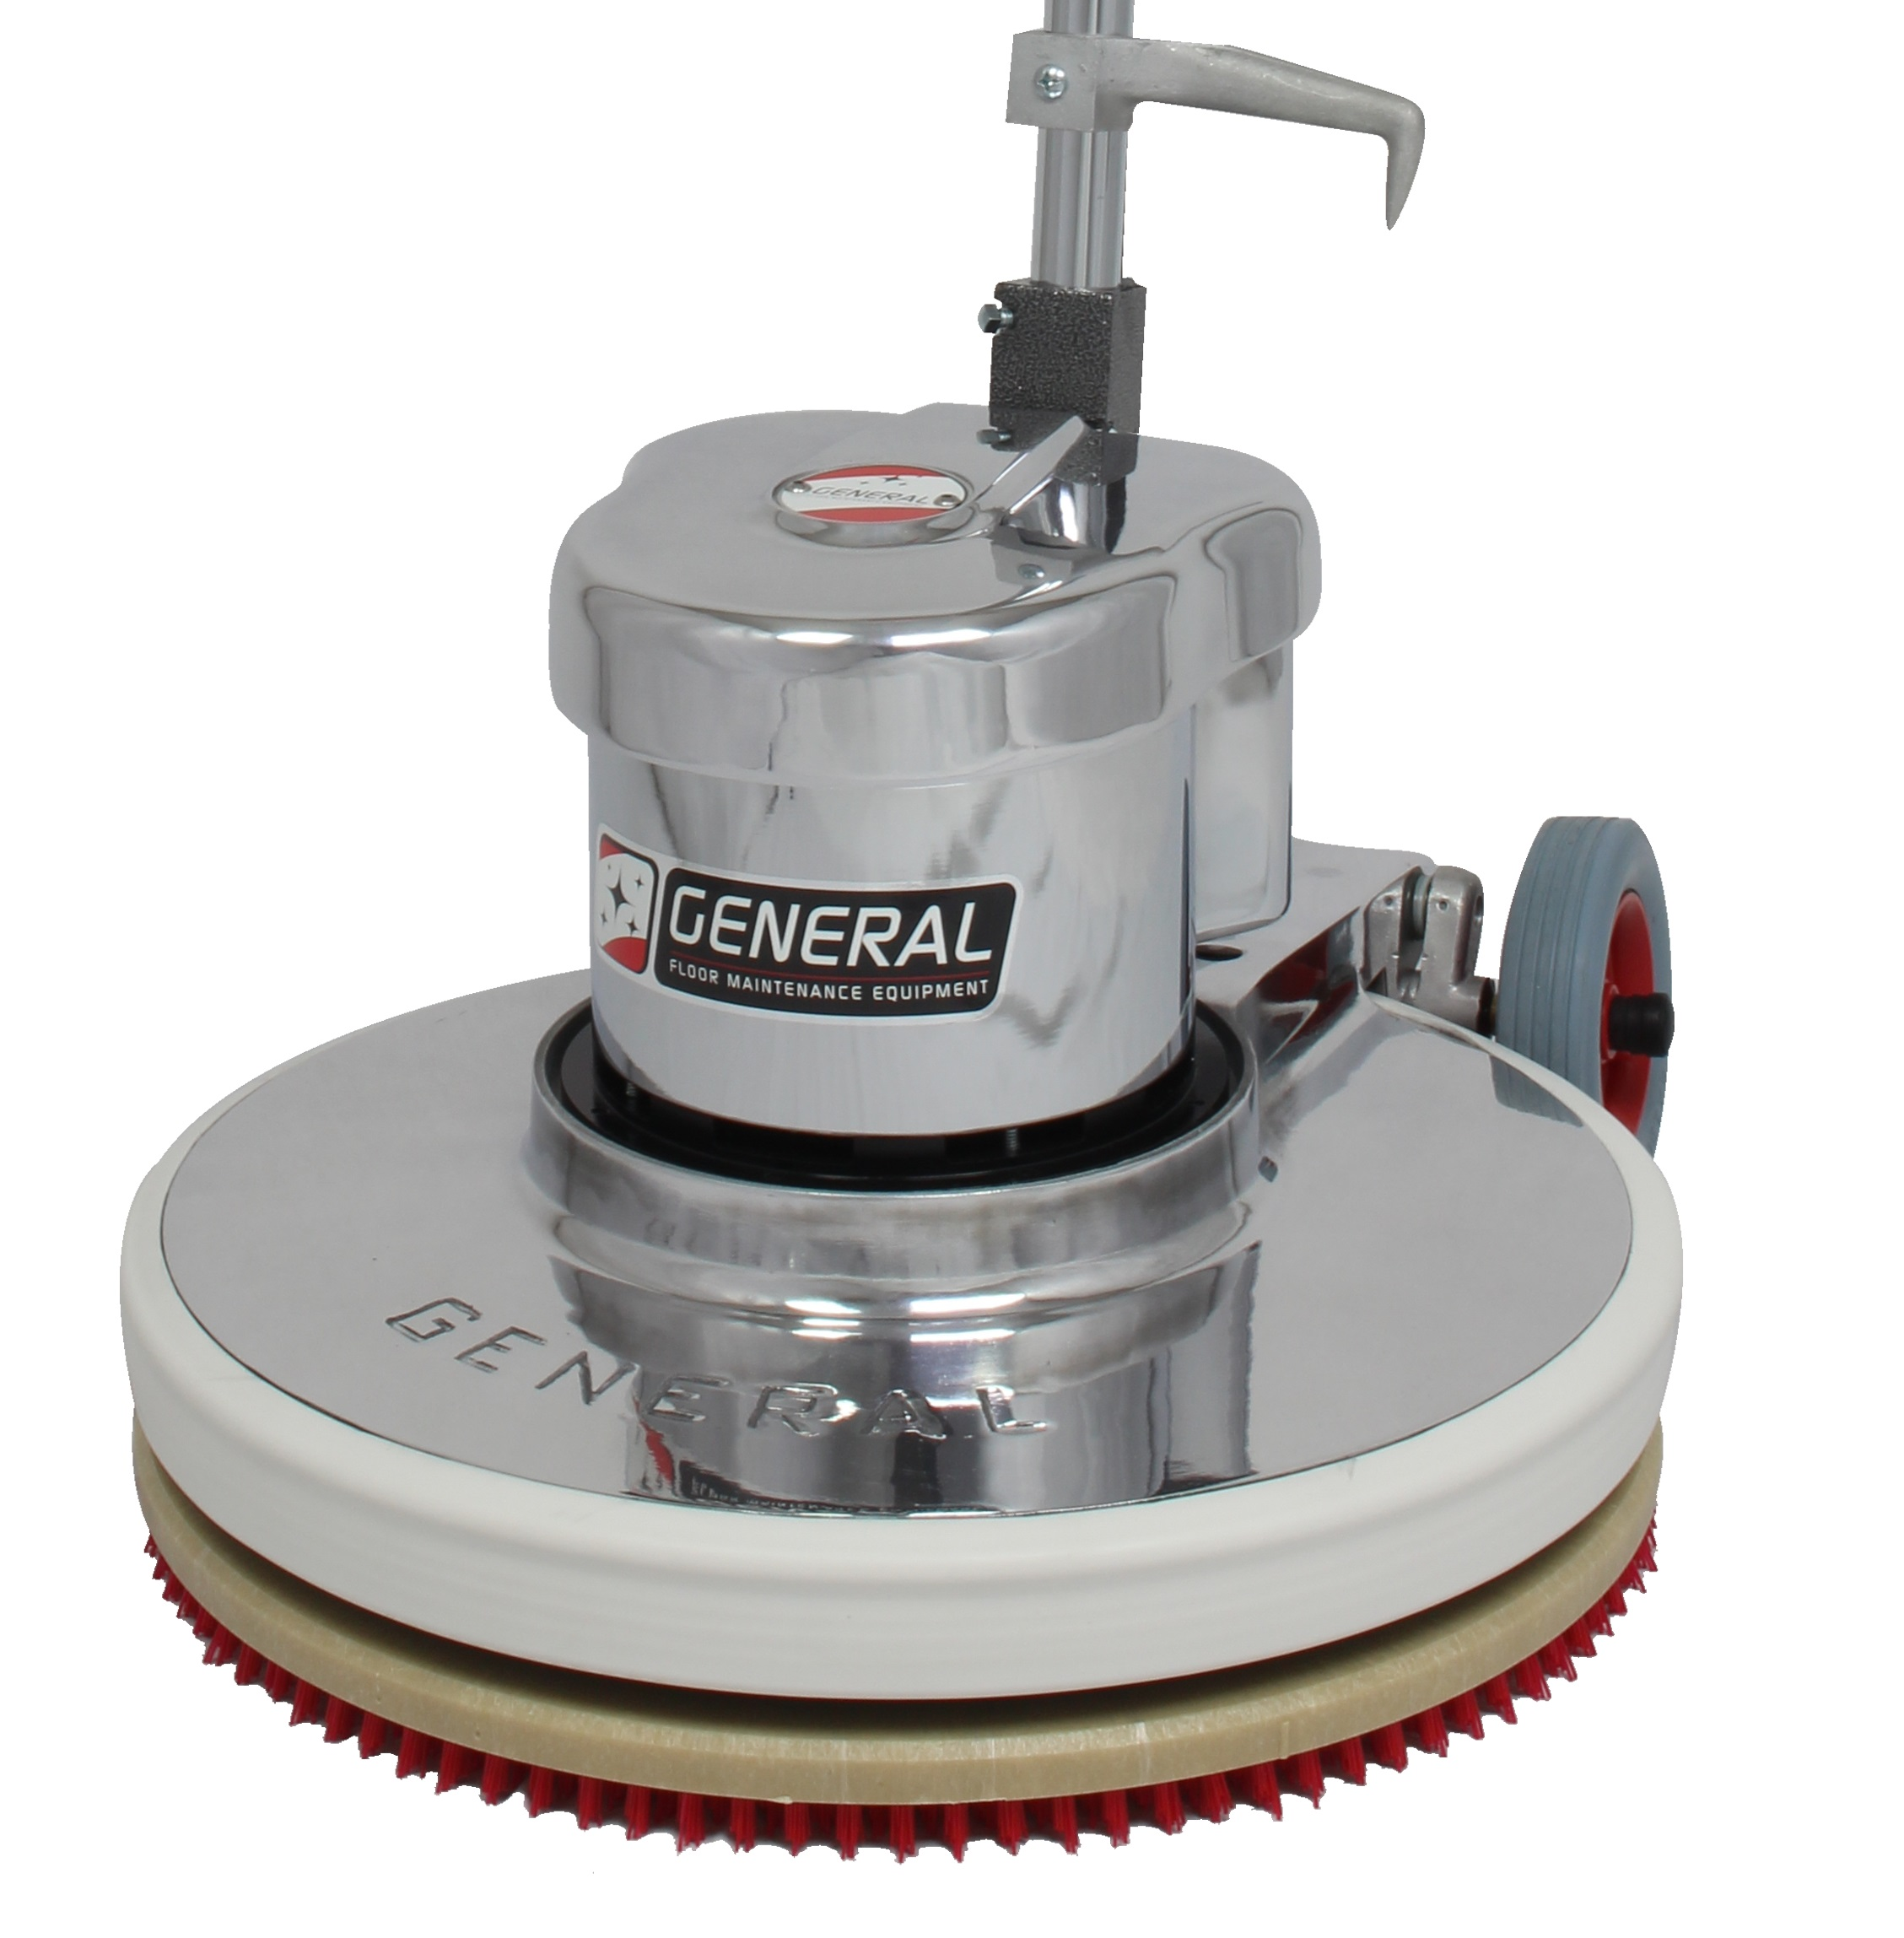 "KCD-20 GENERAL Floorcraft 20"" Floor"